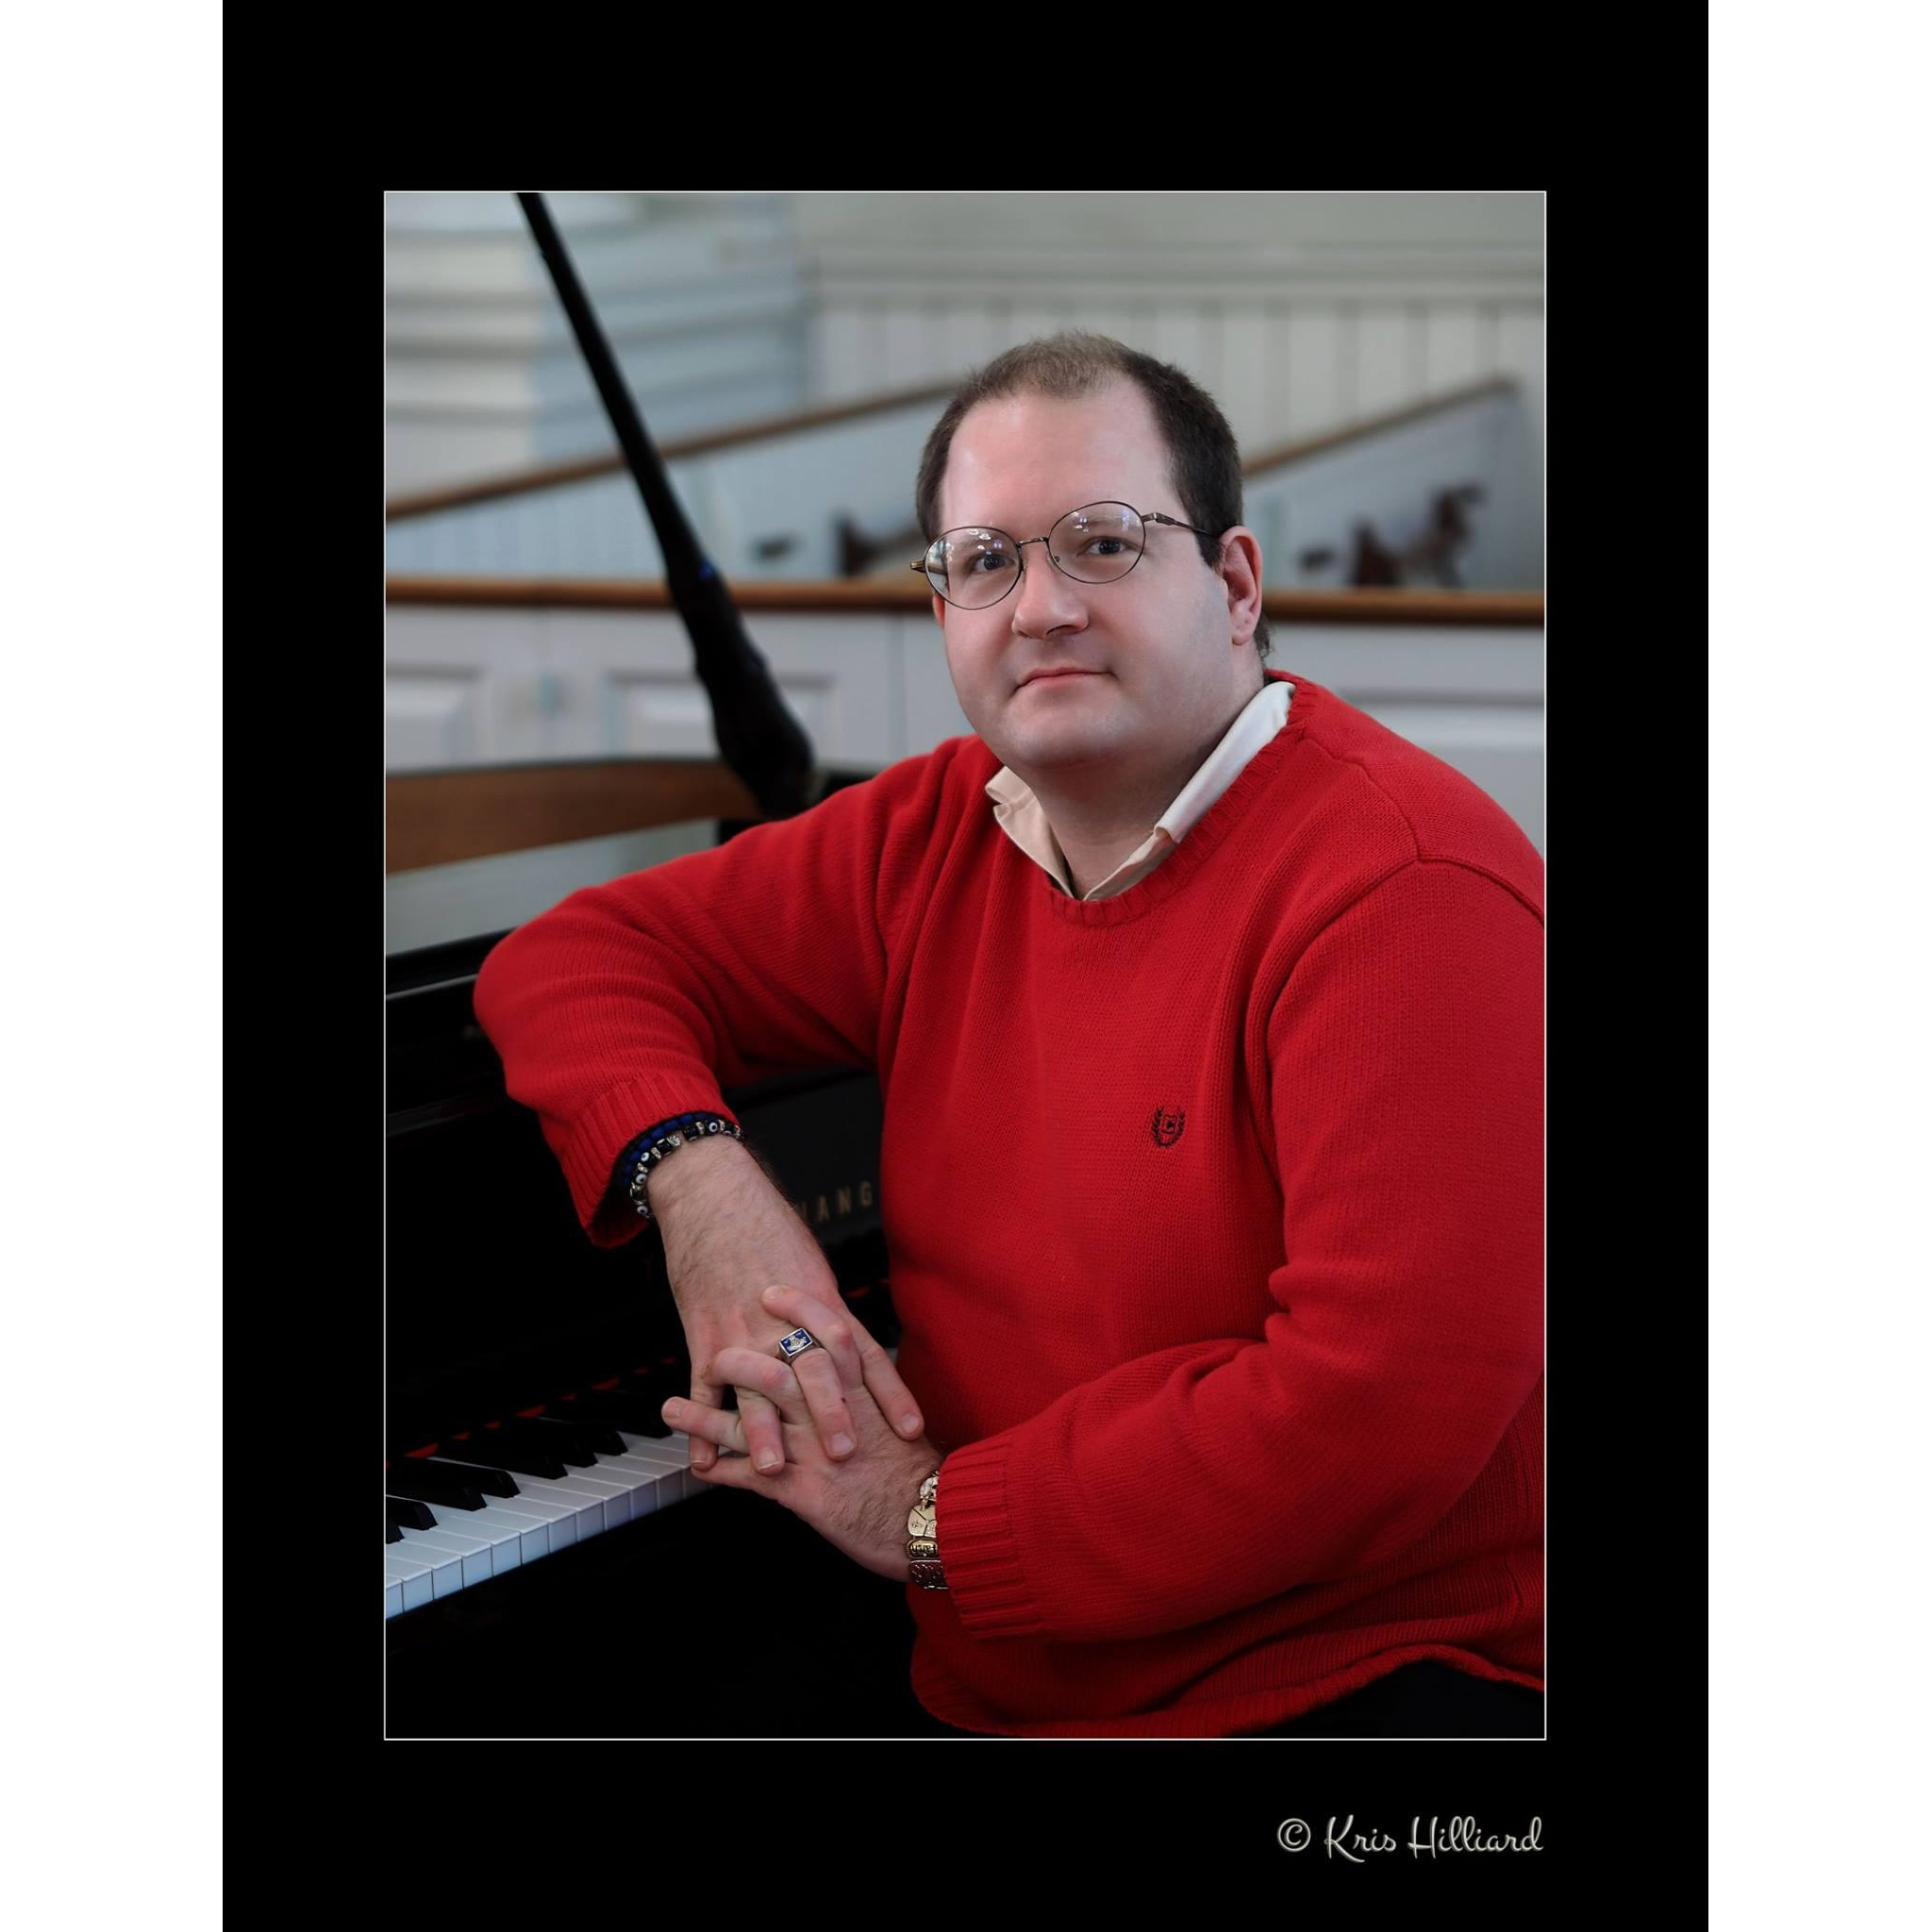 Gabe Toth Music Instruction